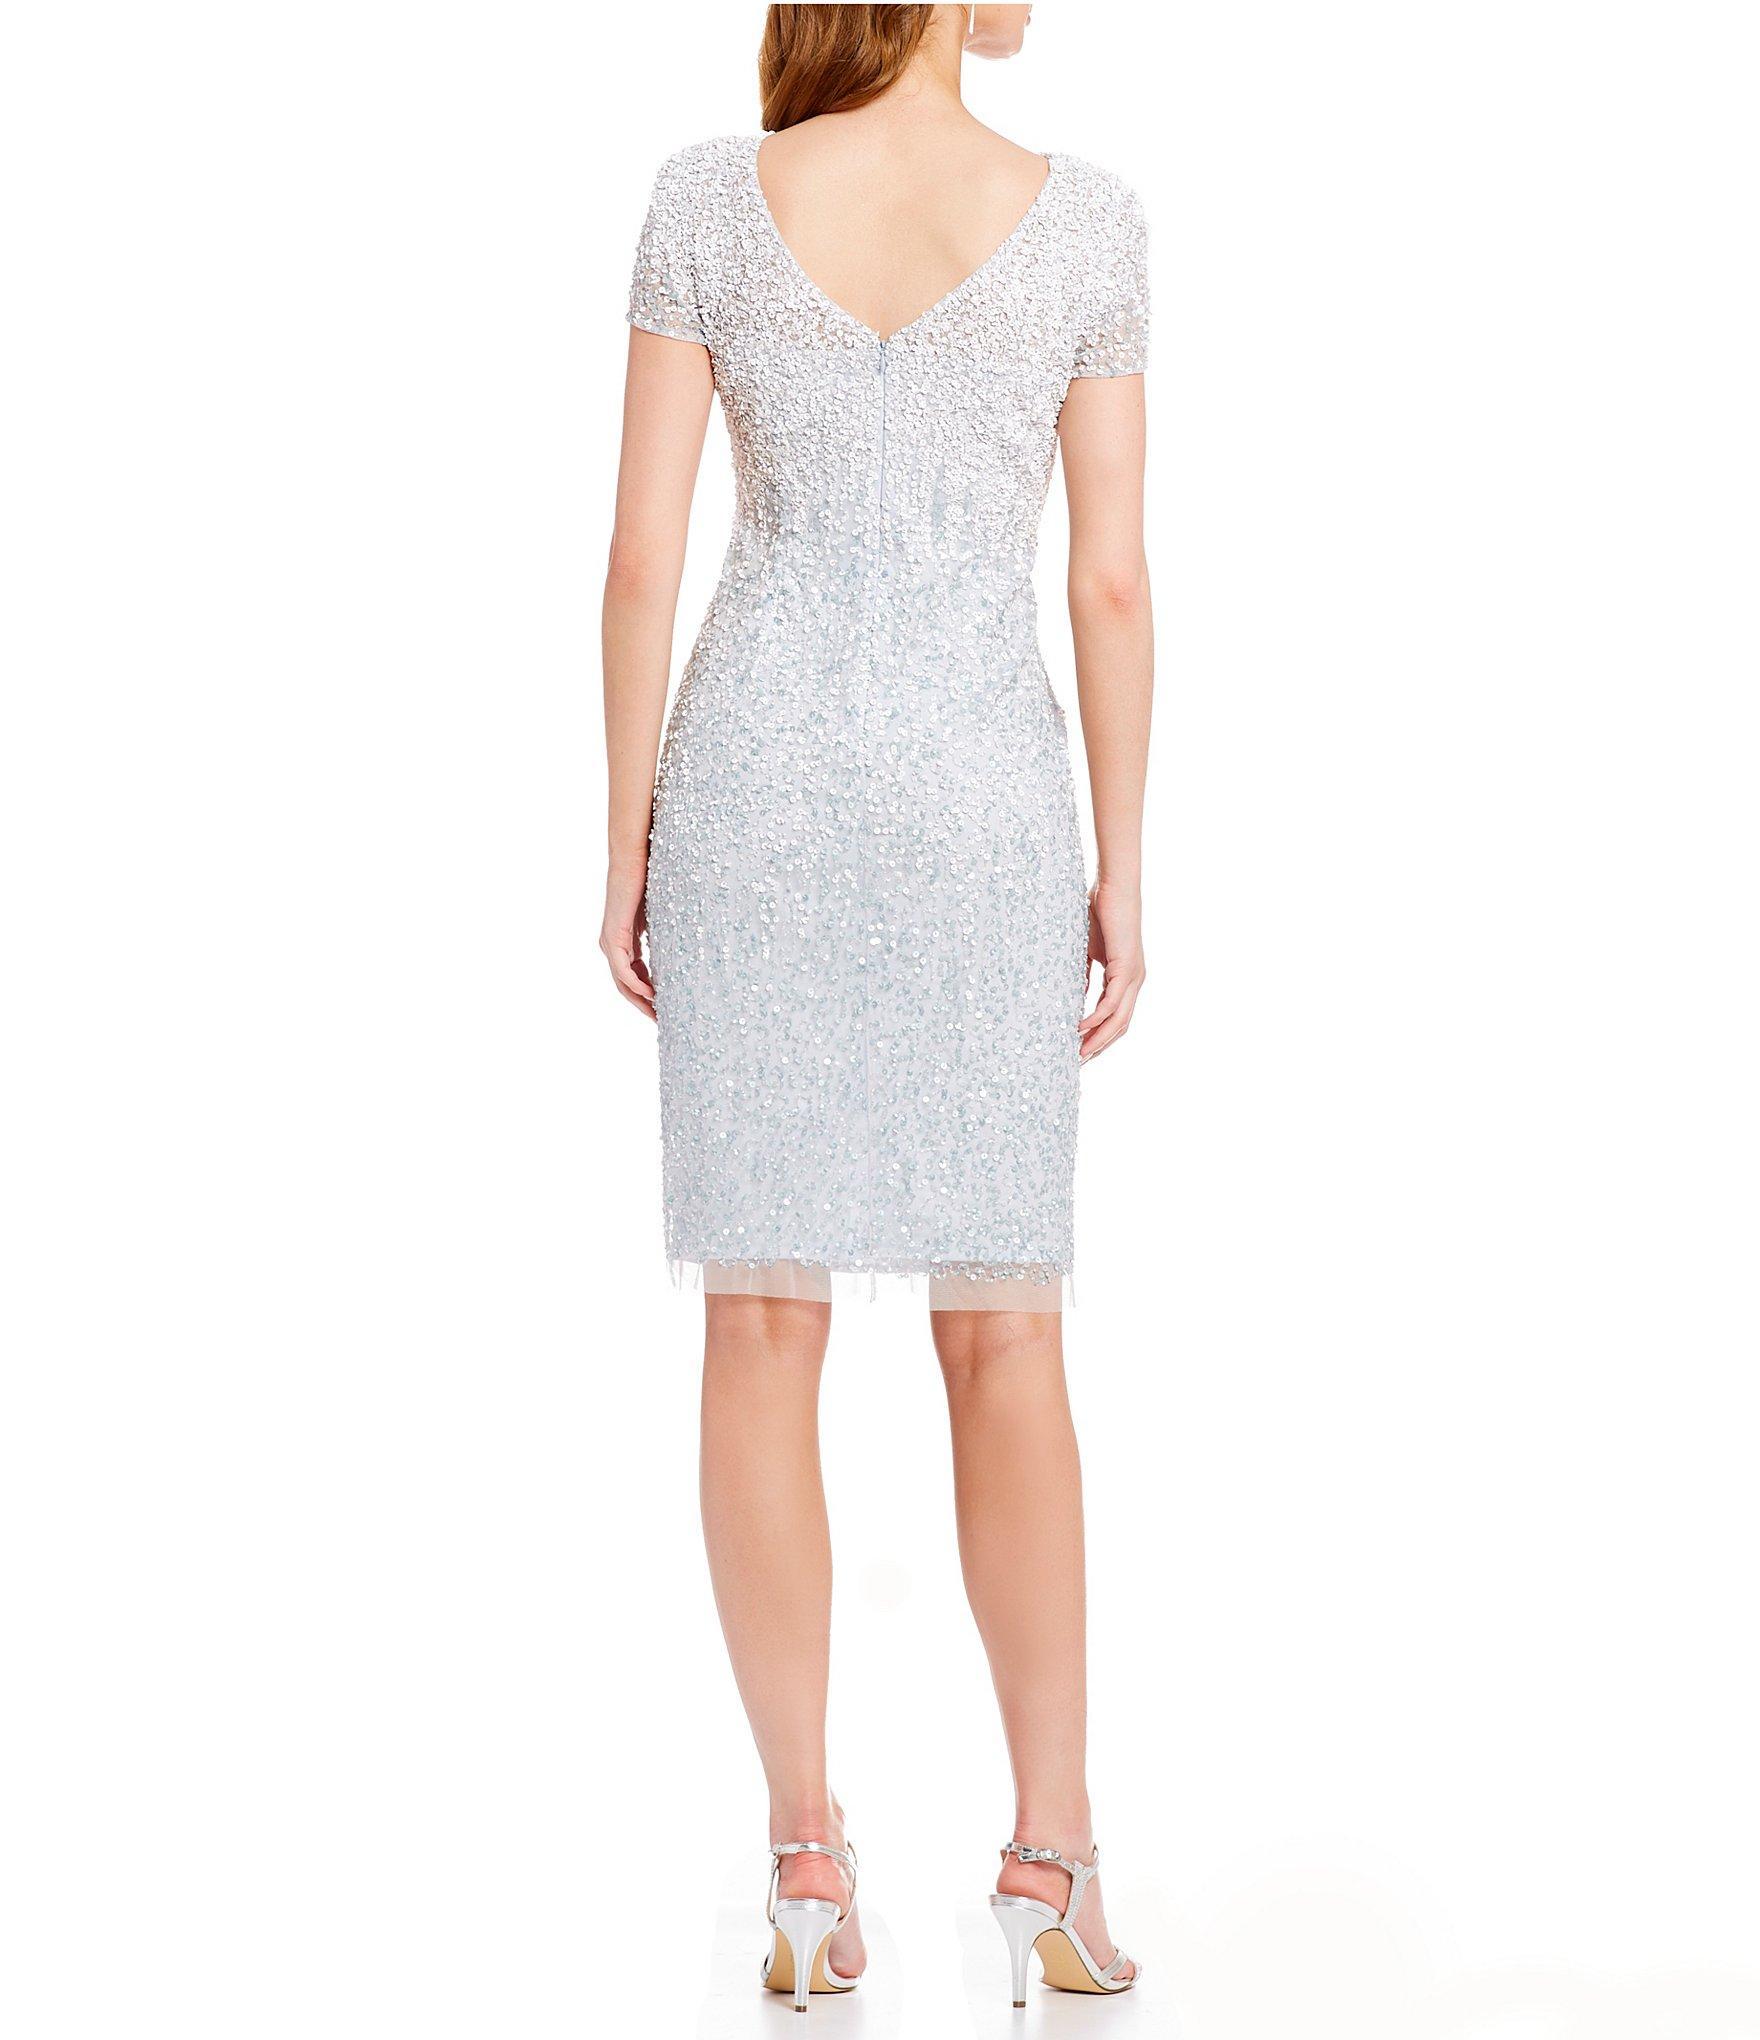 35b746ab987 Lyst - Adrianna Papell Beaded Sheath Dress in White